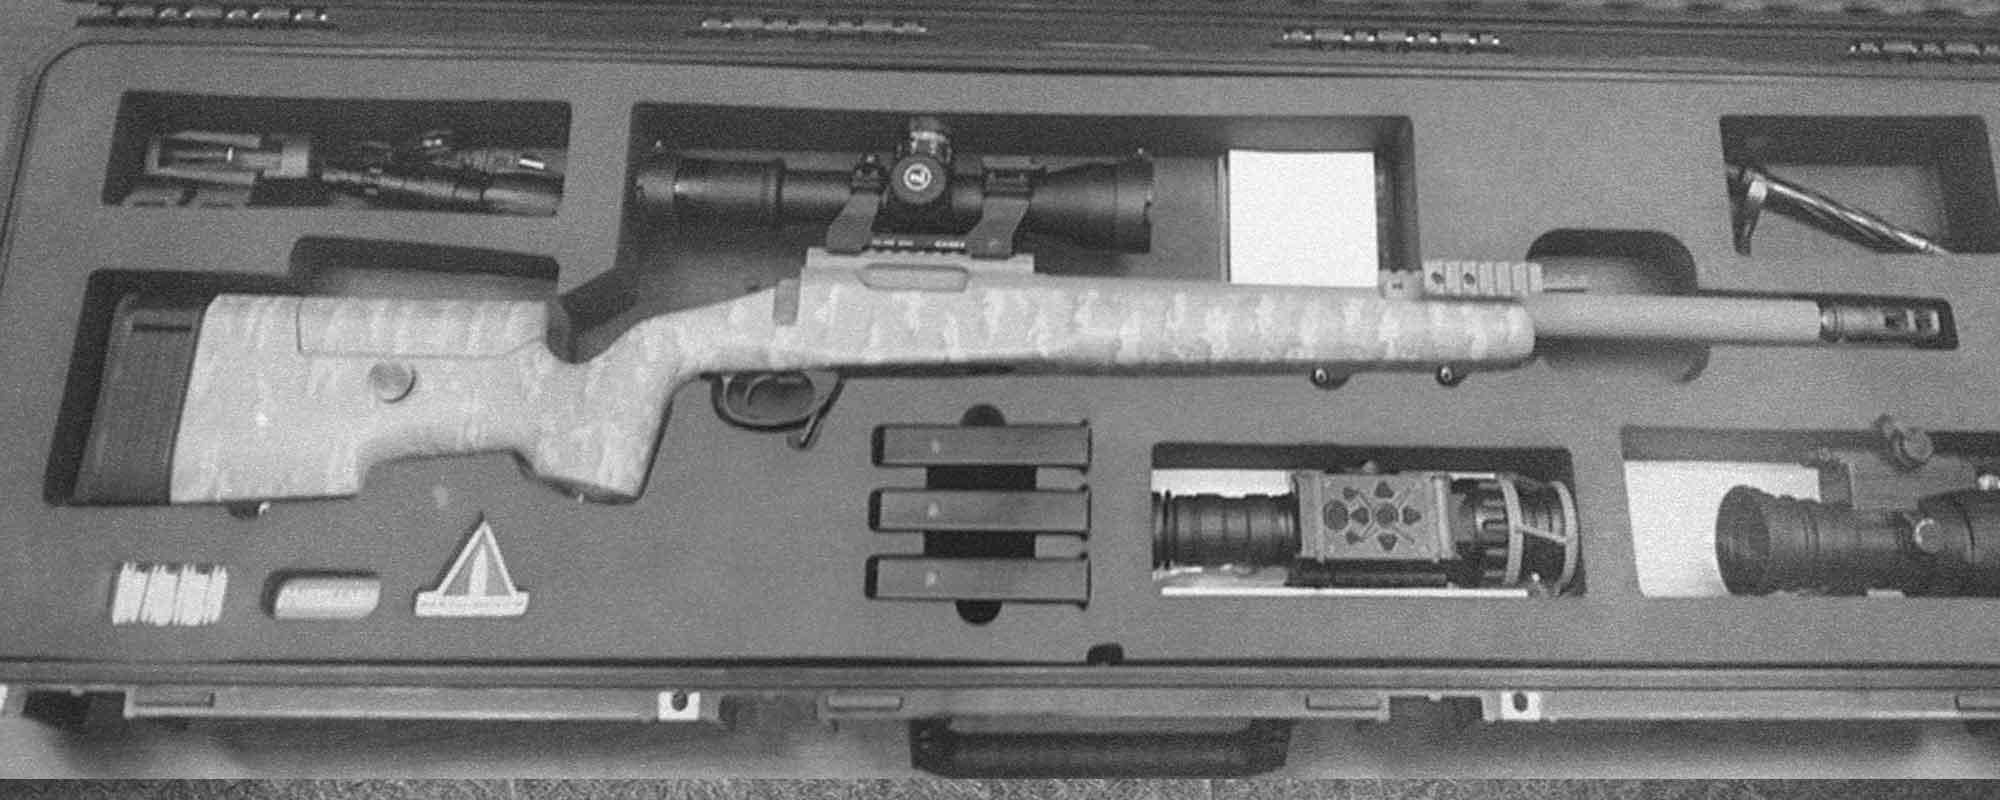 ATACSOL Precision Rifles